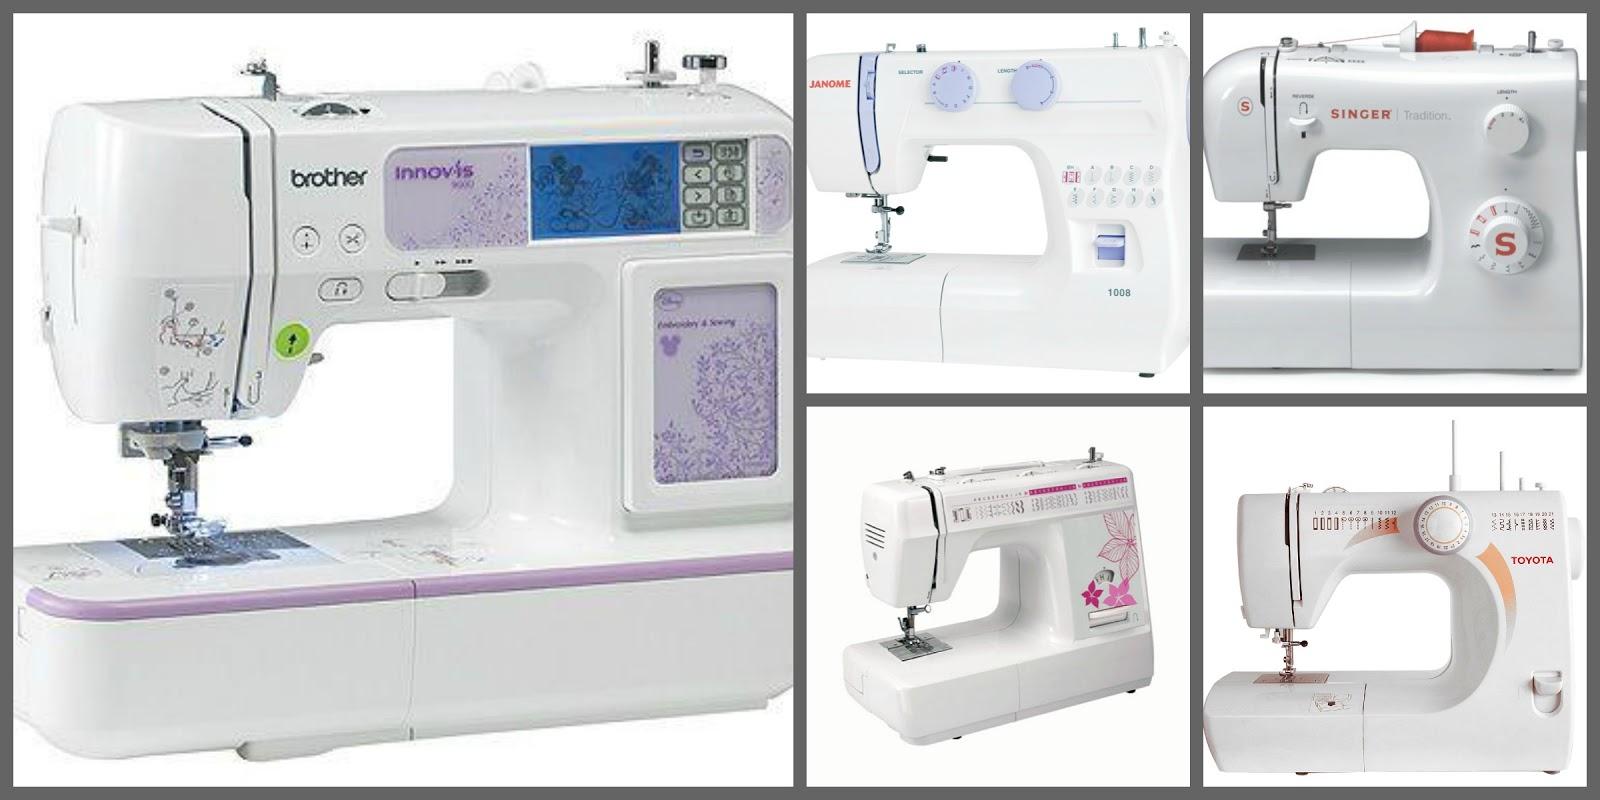 cdb47dbd41e Cuál máquina de coser comprar  - Coser es fácil